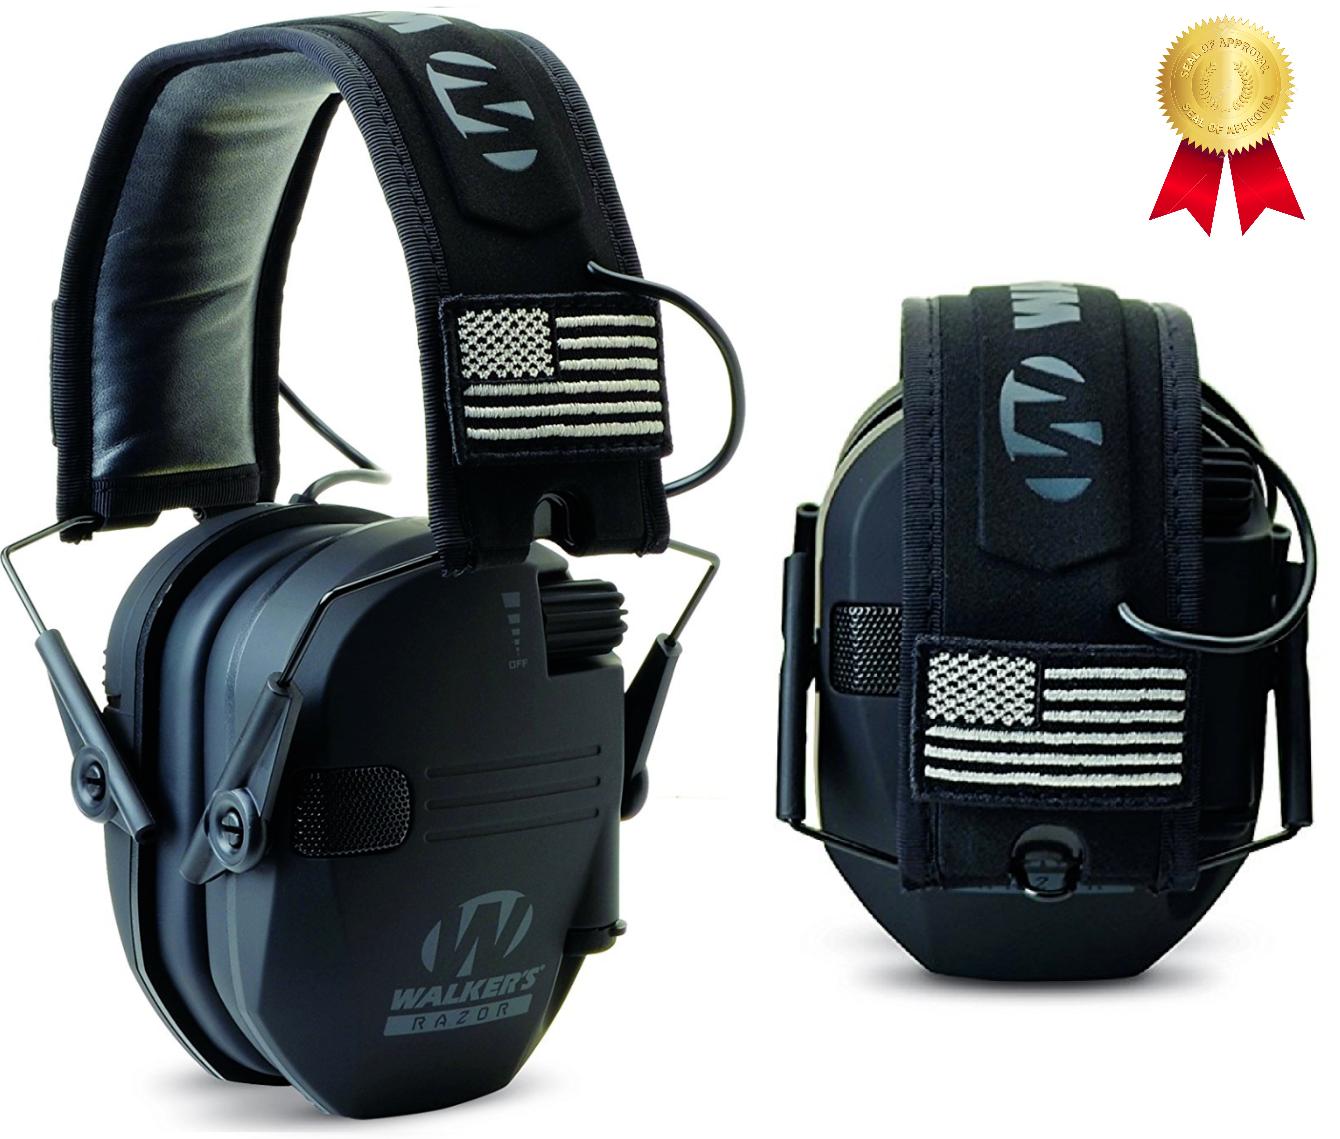 Walker's Muff RAZOR Slim Electronic Hearing Protector 23 dB